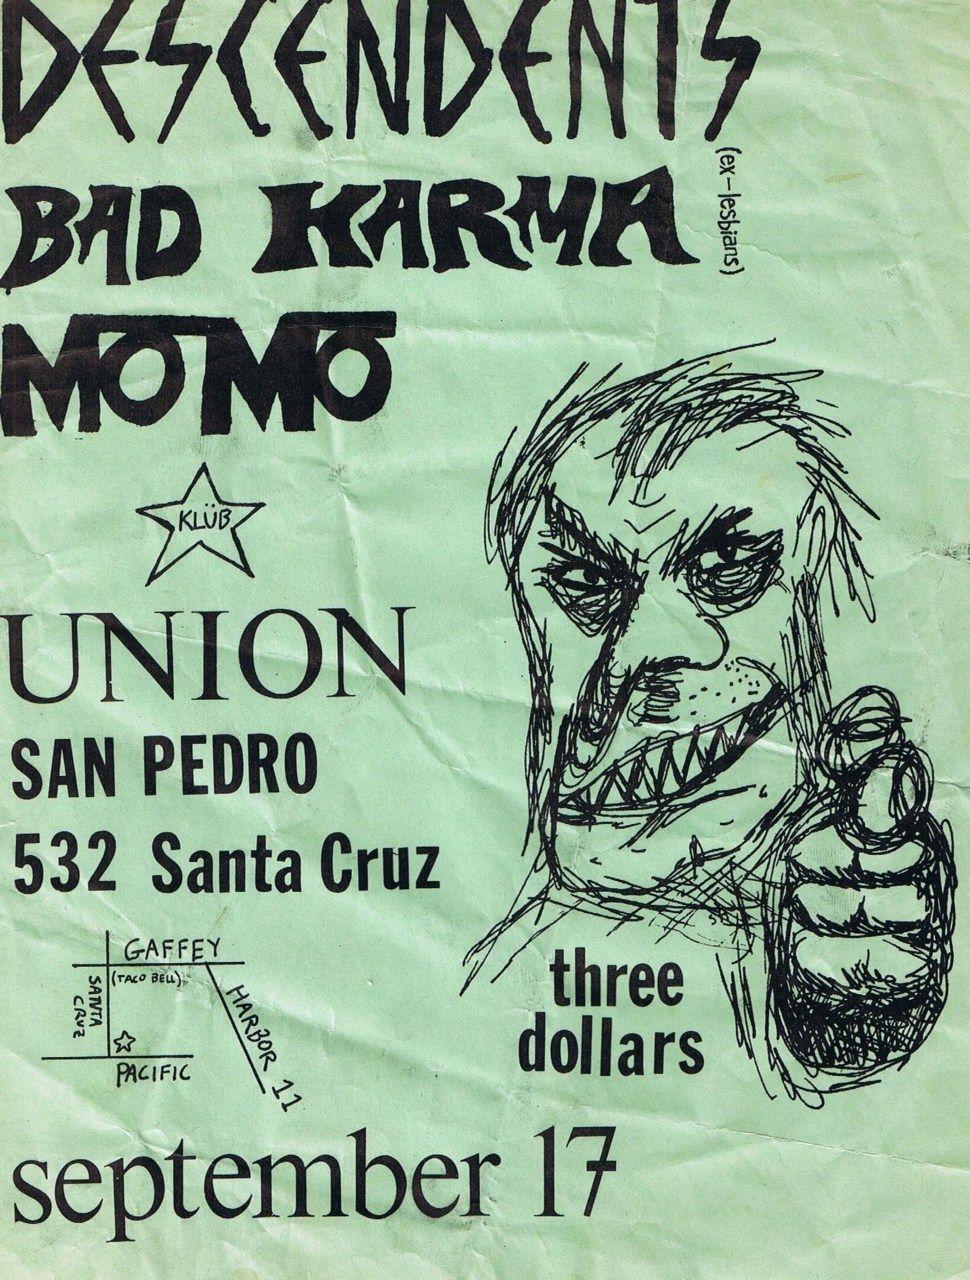 Old Punk Flyers Photo San pedro, Rock posters, Karma